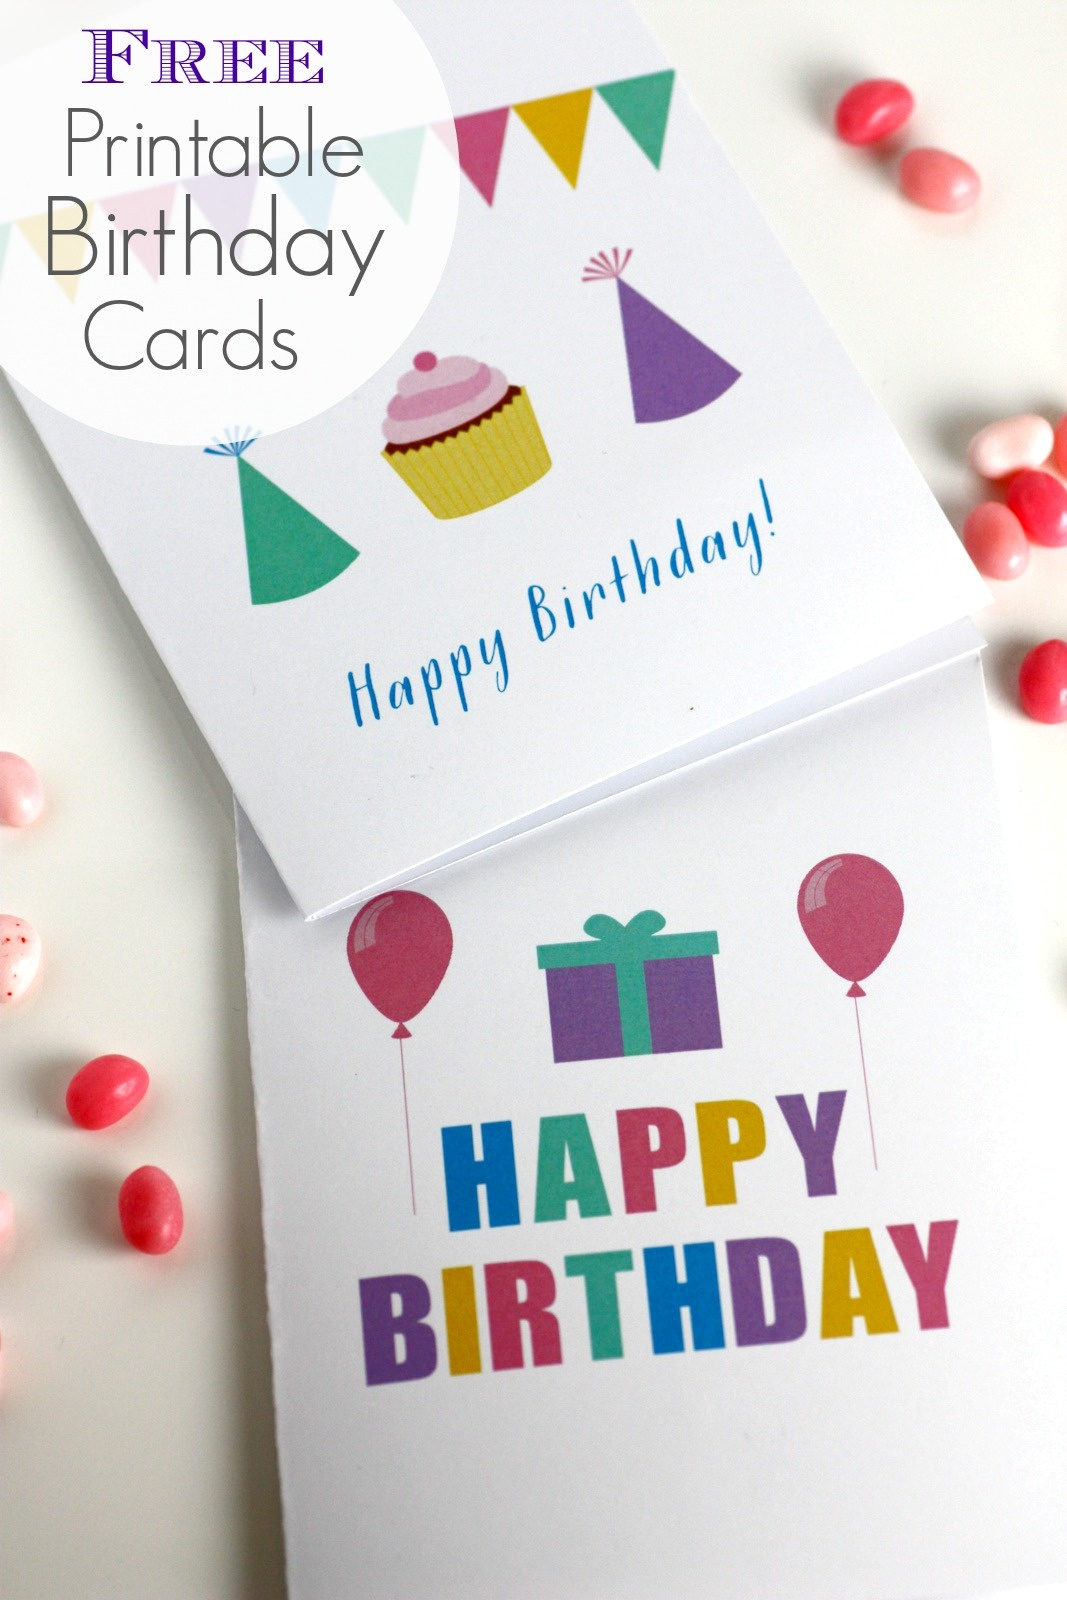 Free Printable Blank Birthday Cards | Catch My Party - Free Printable Birthday Cards For Boys